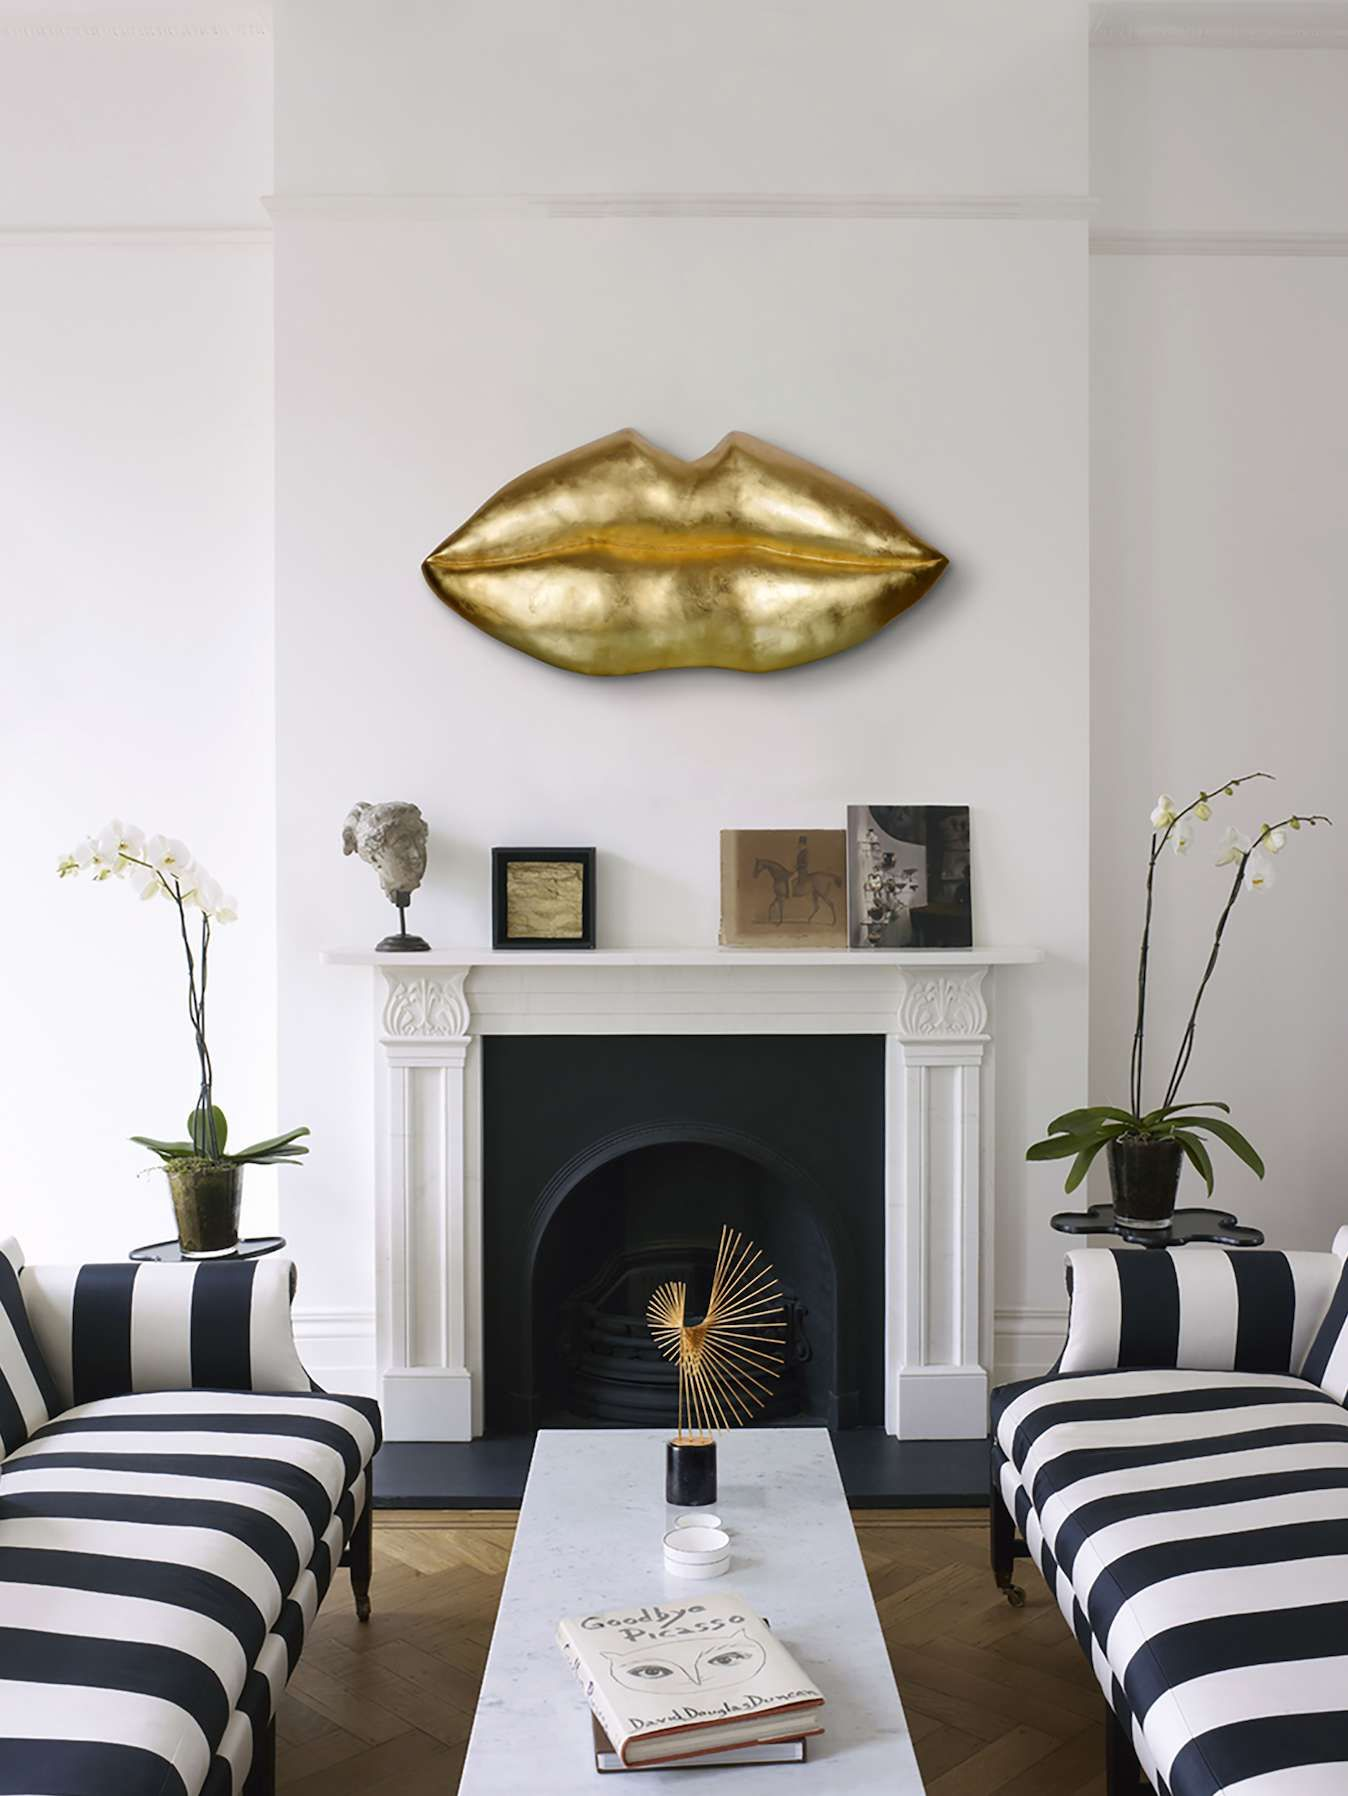 Kiss Kiss Metallic Gold Lips Wall Sculpture | Gold lips, Wall ...